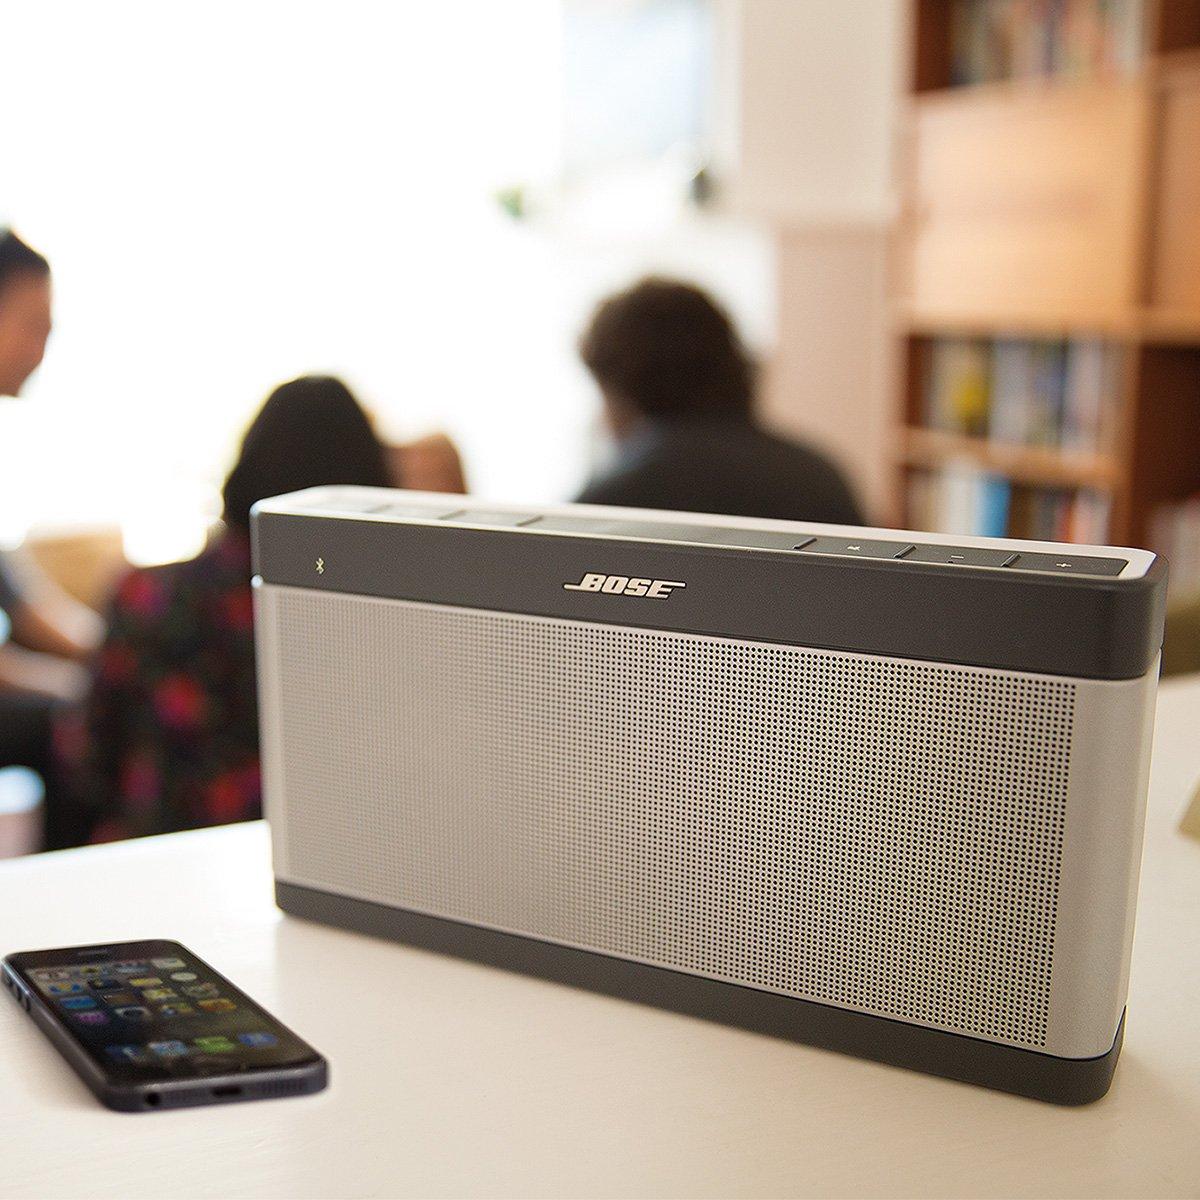 Altavoz Bluetooth Bose SoundLink Bluetooth III por solo 248€